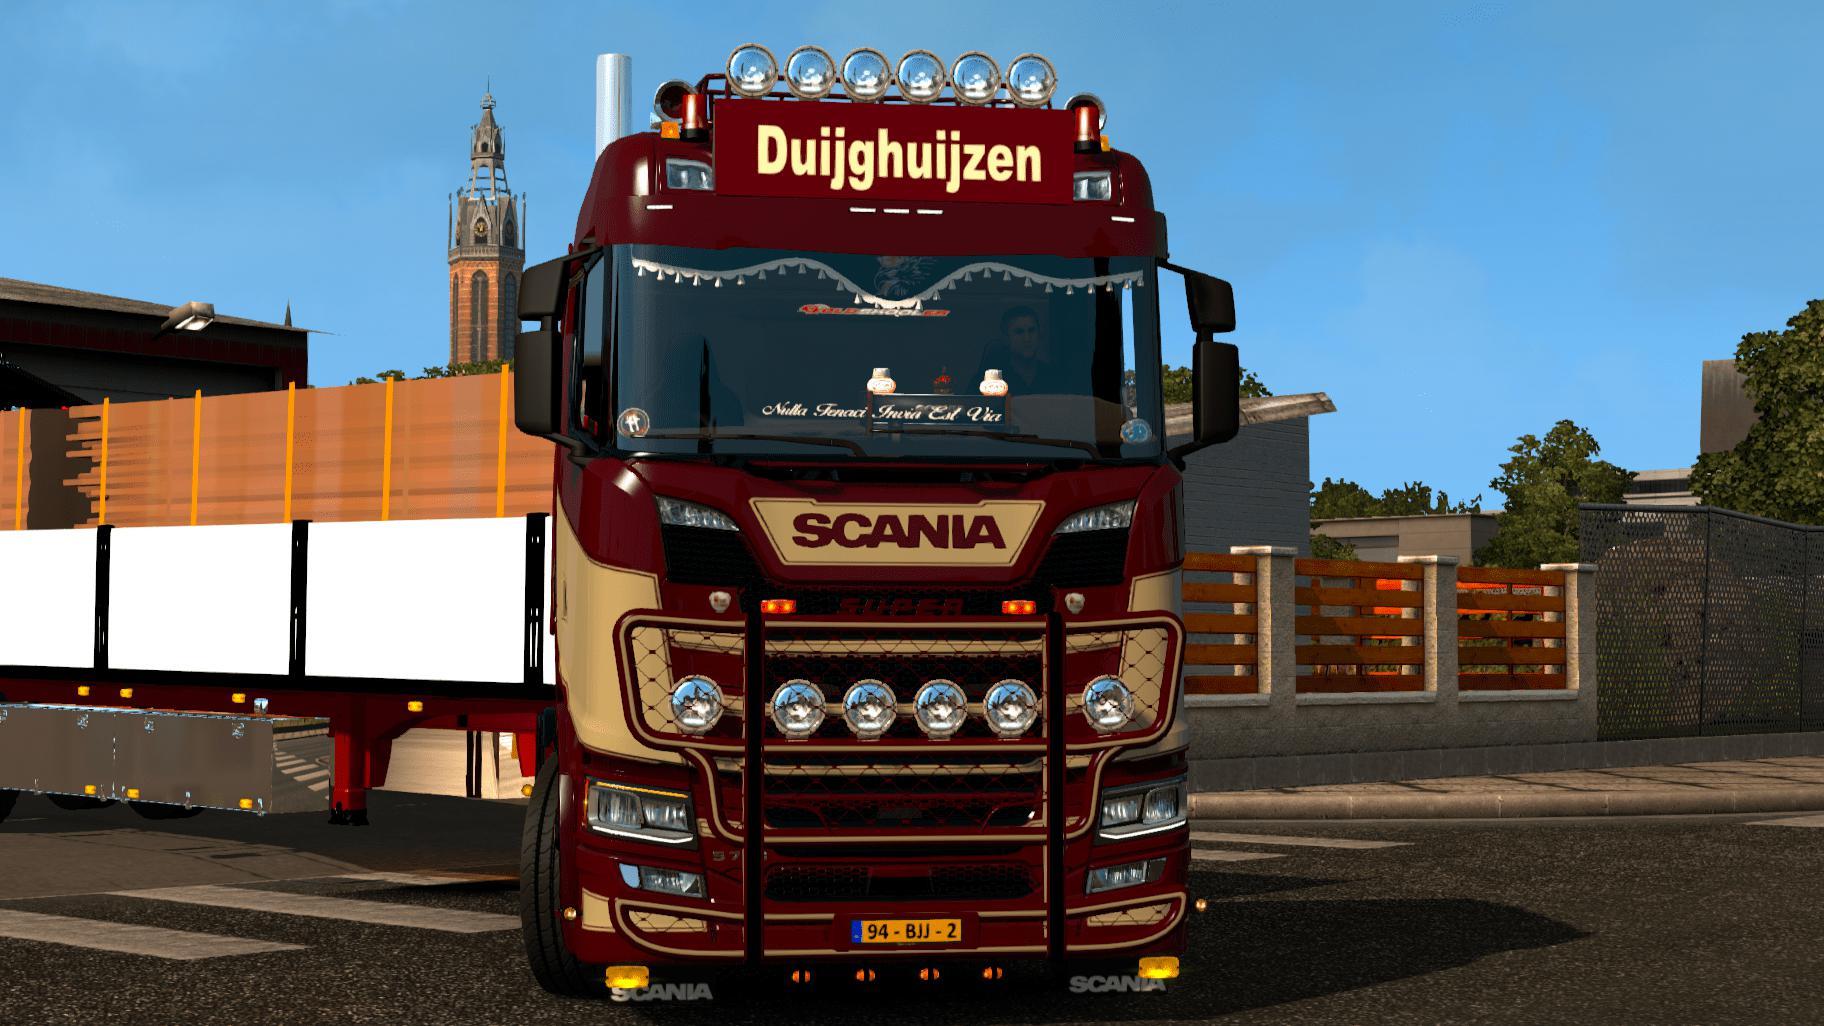 ETS2 - Scania S Duijghuijzen Skin (1.35.X)